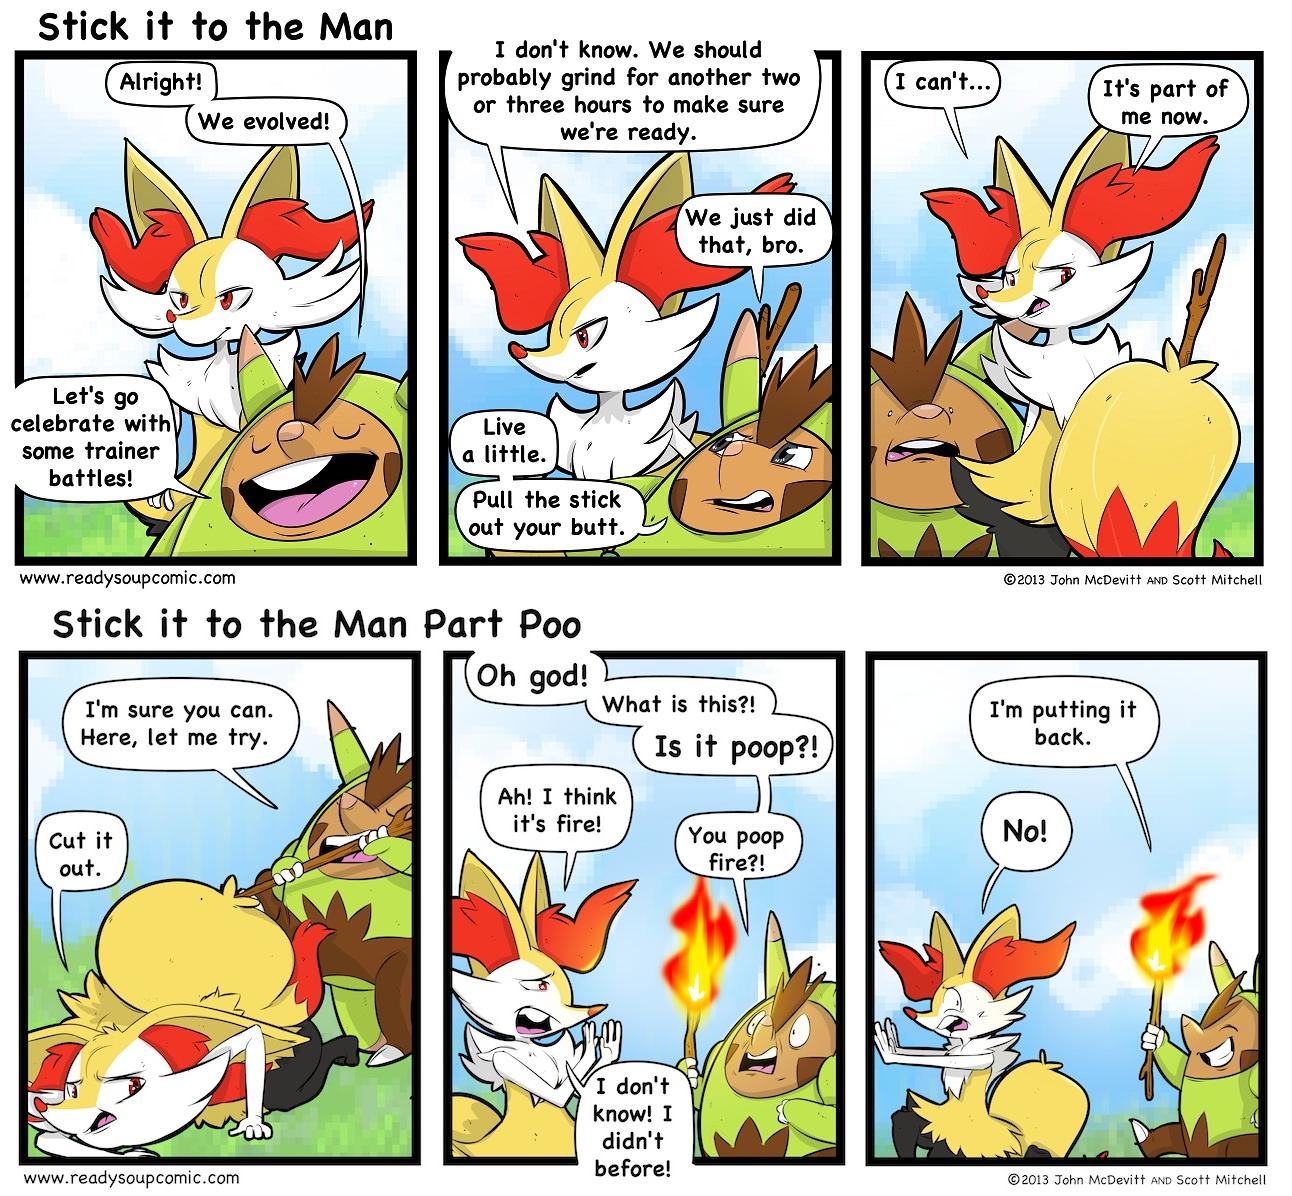 Stick it to the Man. Source: www.readysoupcomic.com/. braixen quilladin poop fire Pokemon